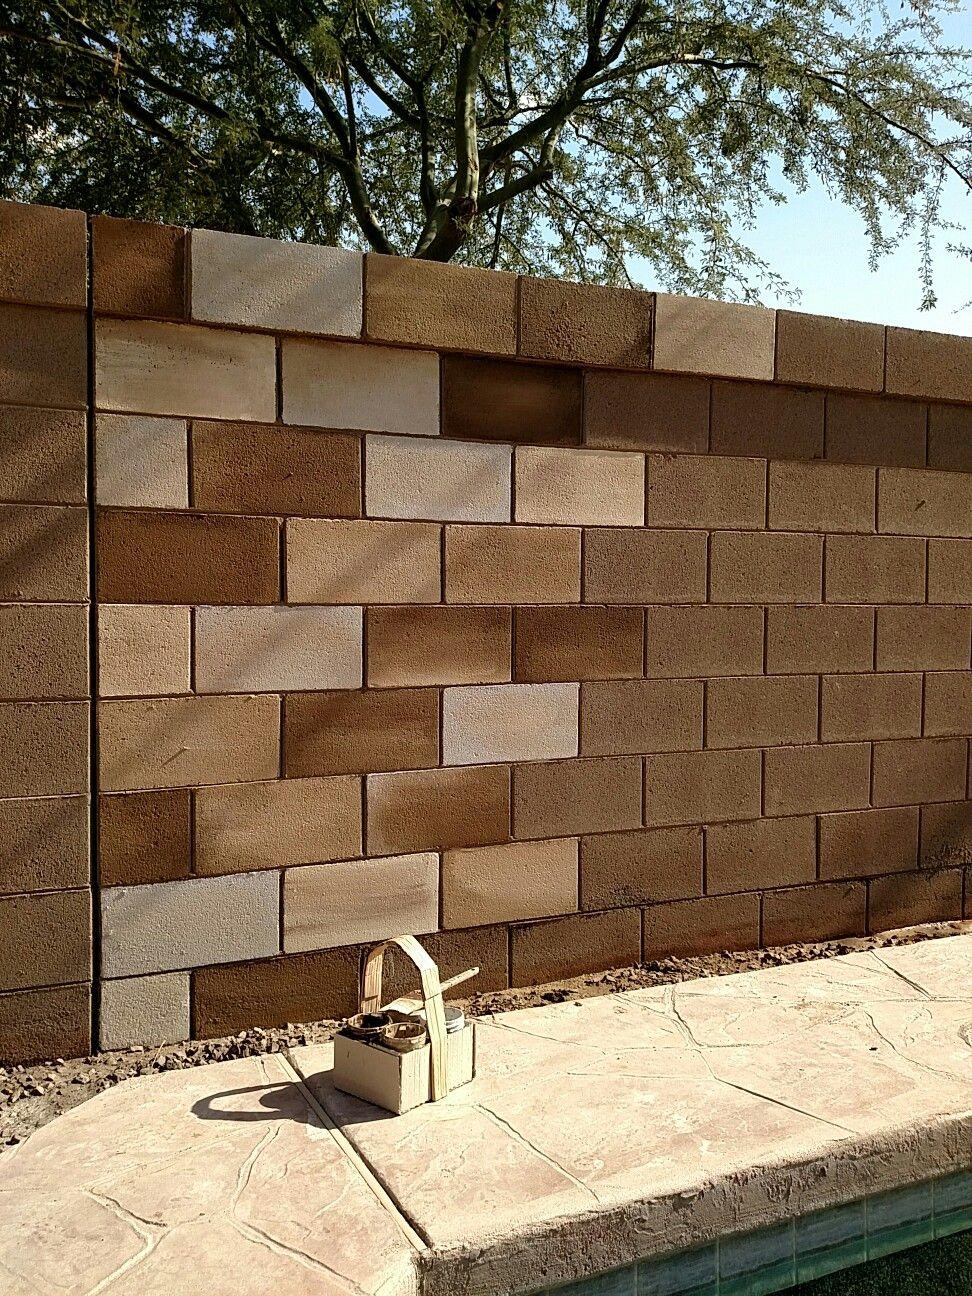 Cinder/ Hollow block wall. | projects | Pinterest | Cinder ...